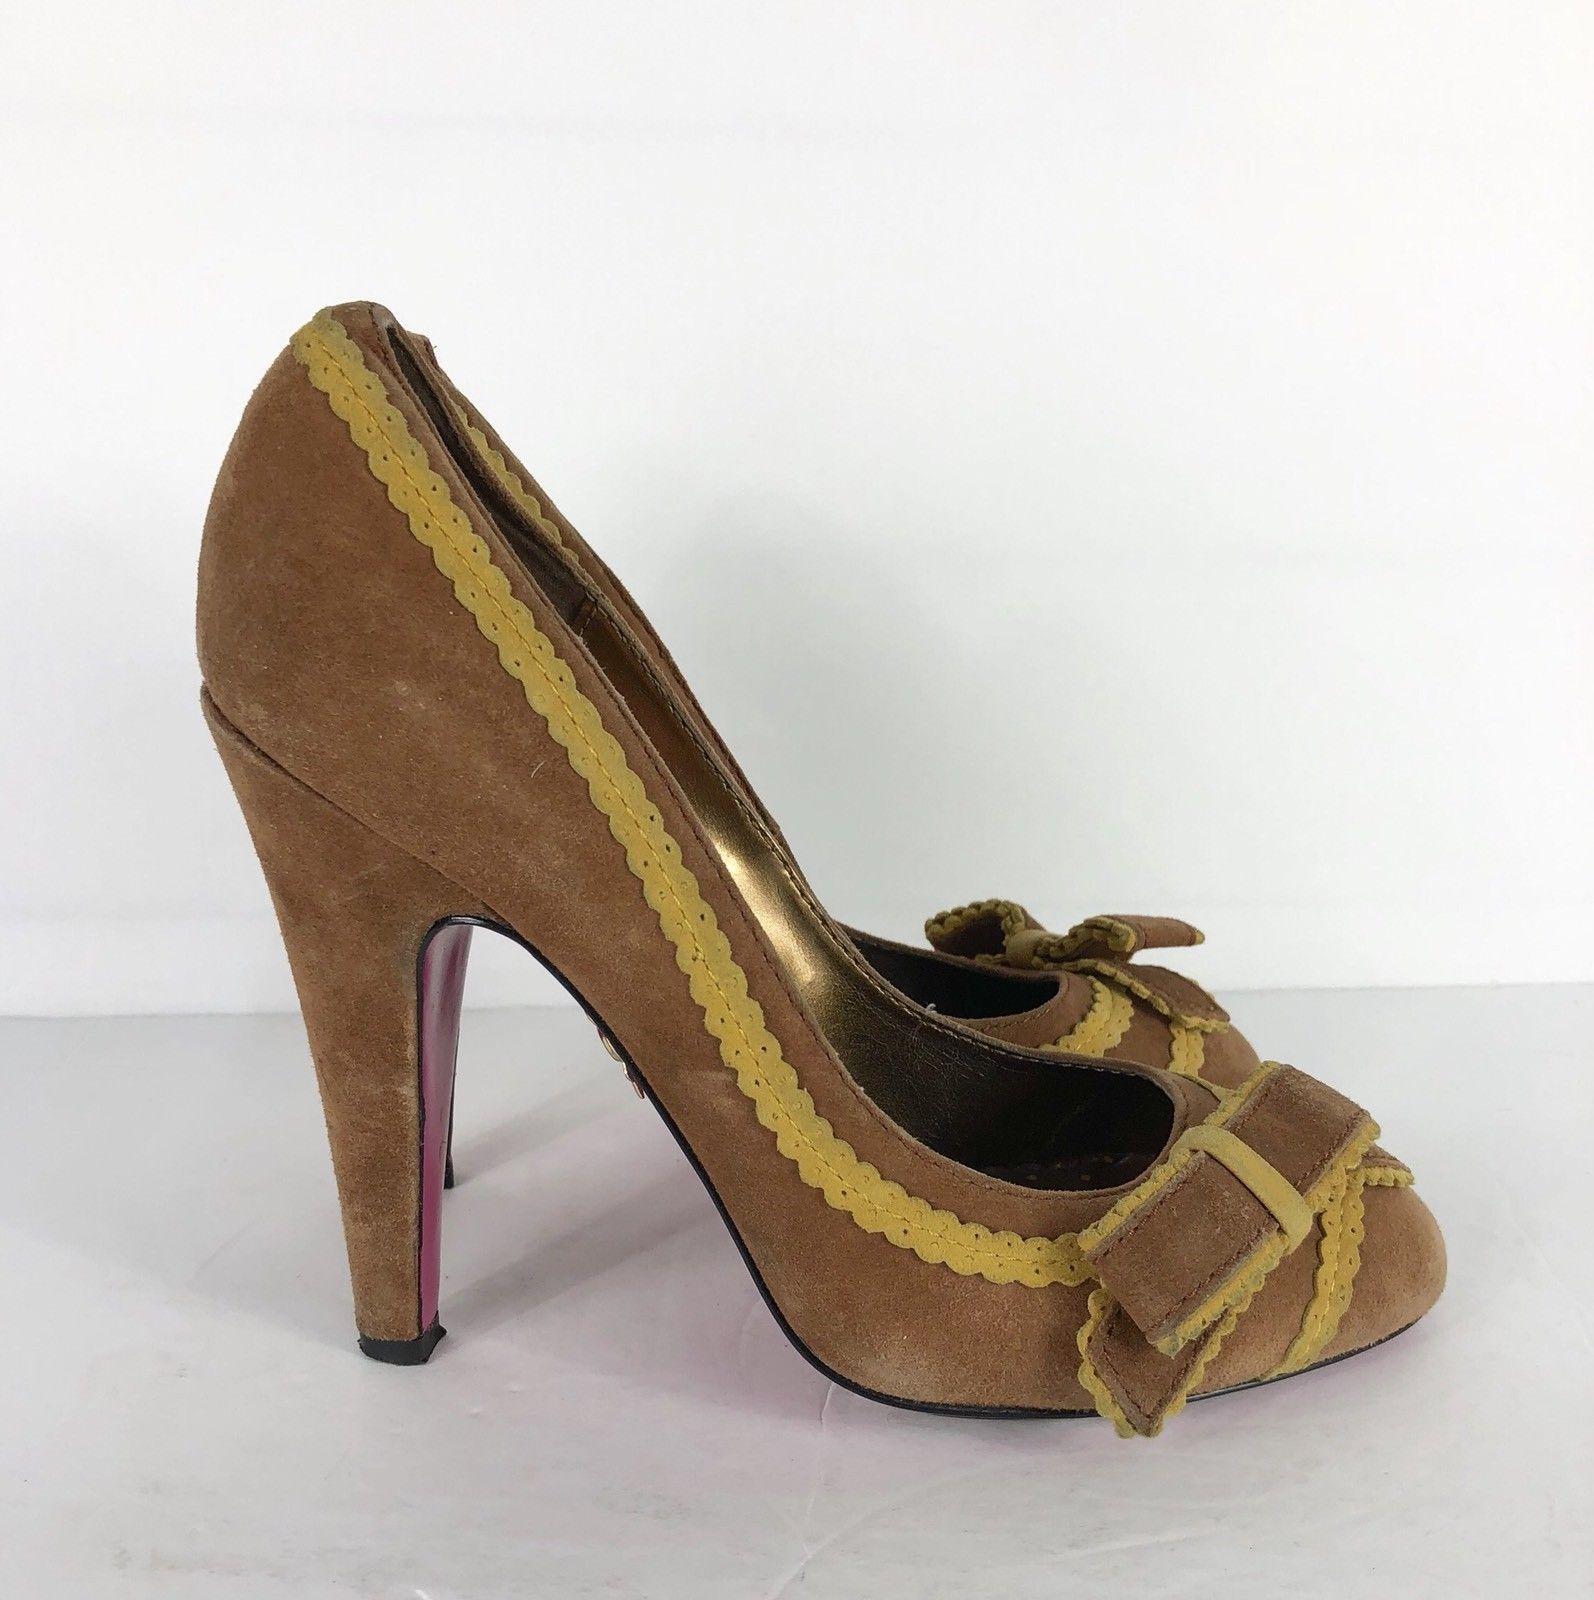 0c8f130cb3d Betsey Johnson Pump Heels Vero Cuoio Vtg Brown Suede Yellow Trim Bow Tie  7.5 M